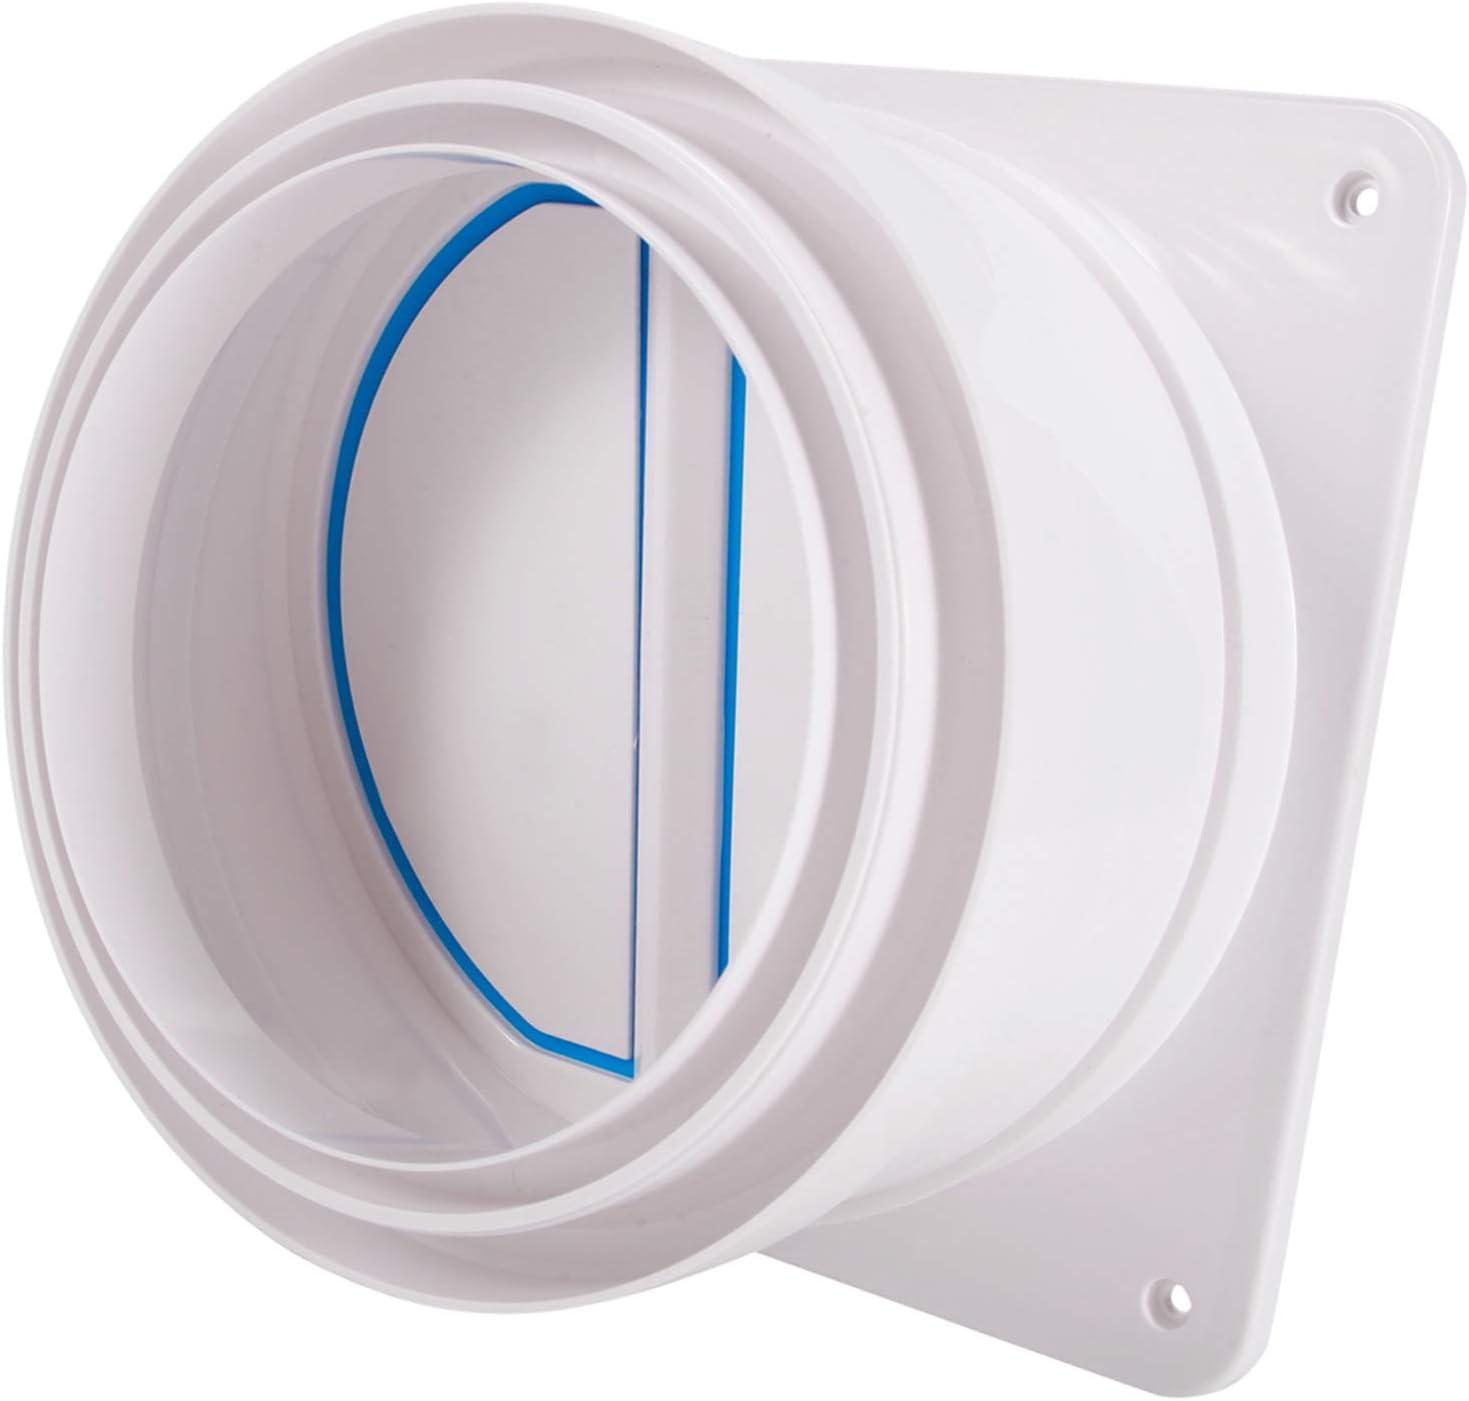 Ranking TOP3 Backdraft Damper 6'' HG POWER Shutter Wall Draft Backdr Super beauty product restock quality top Blocker